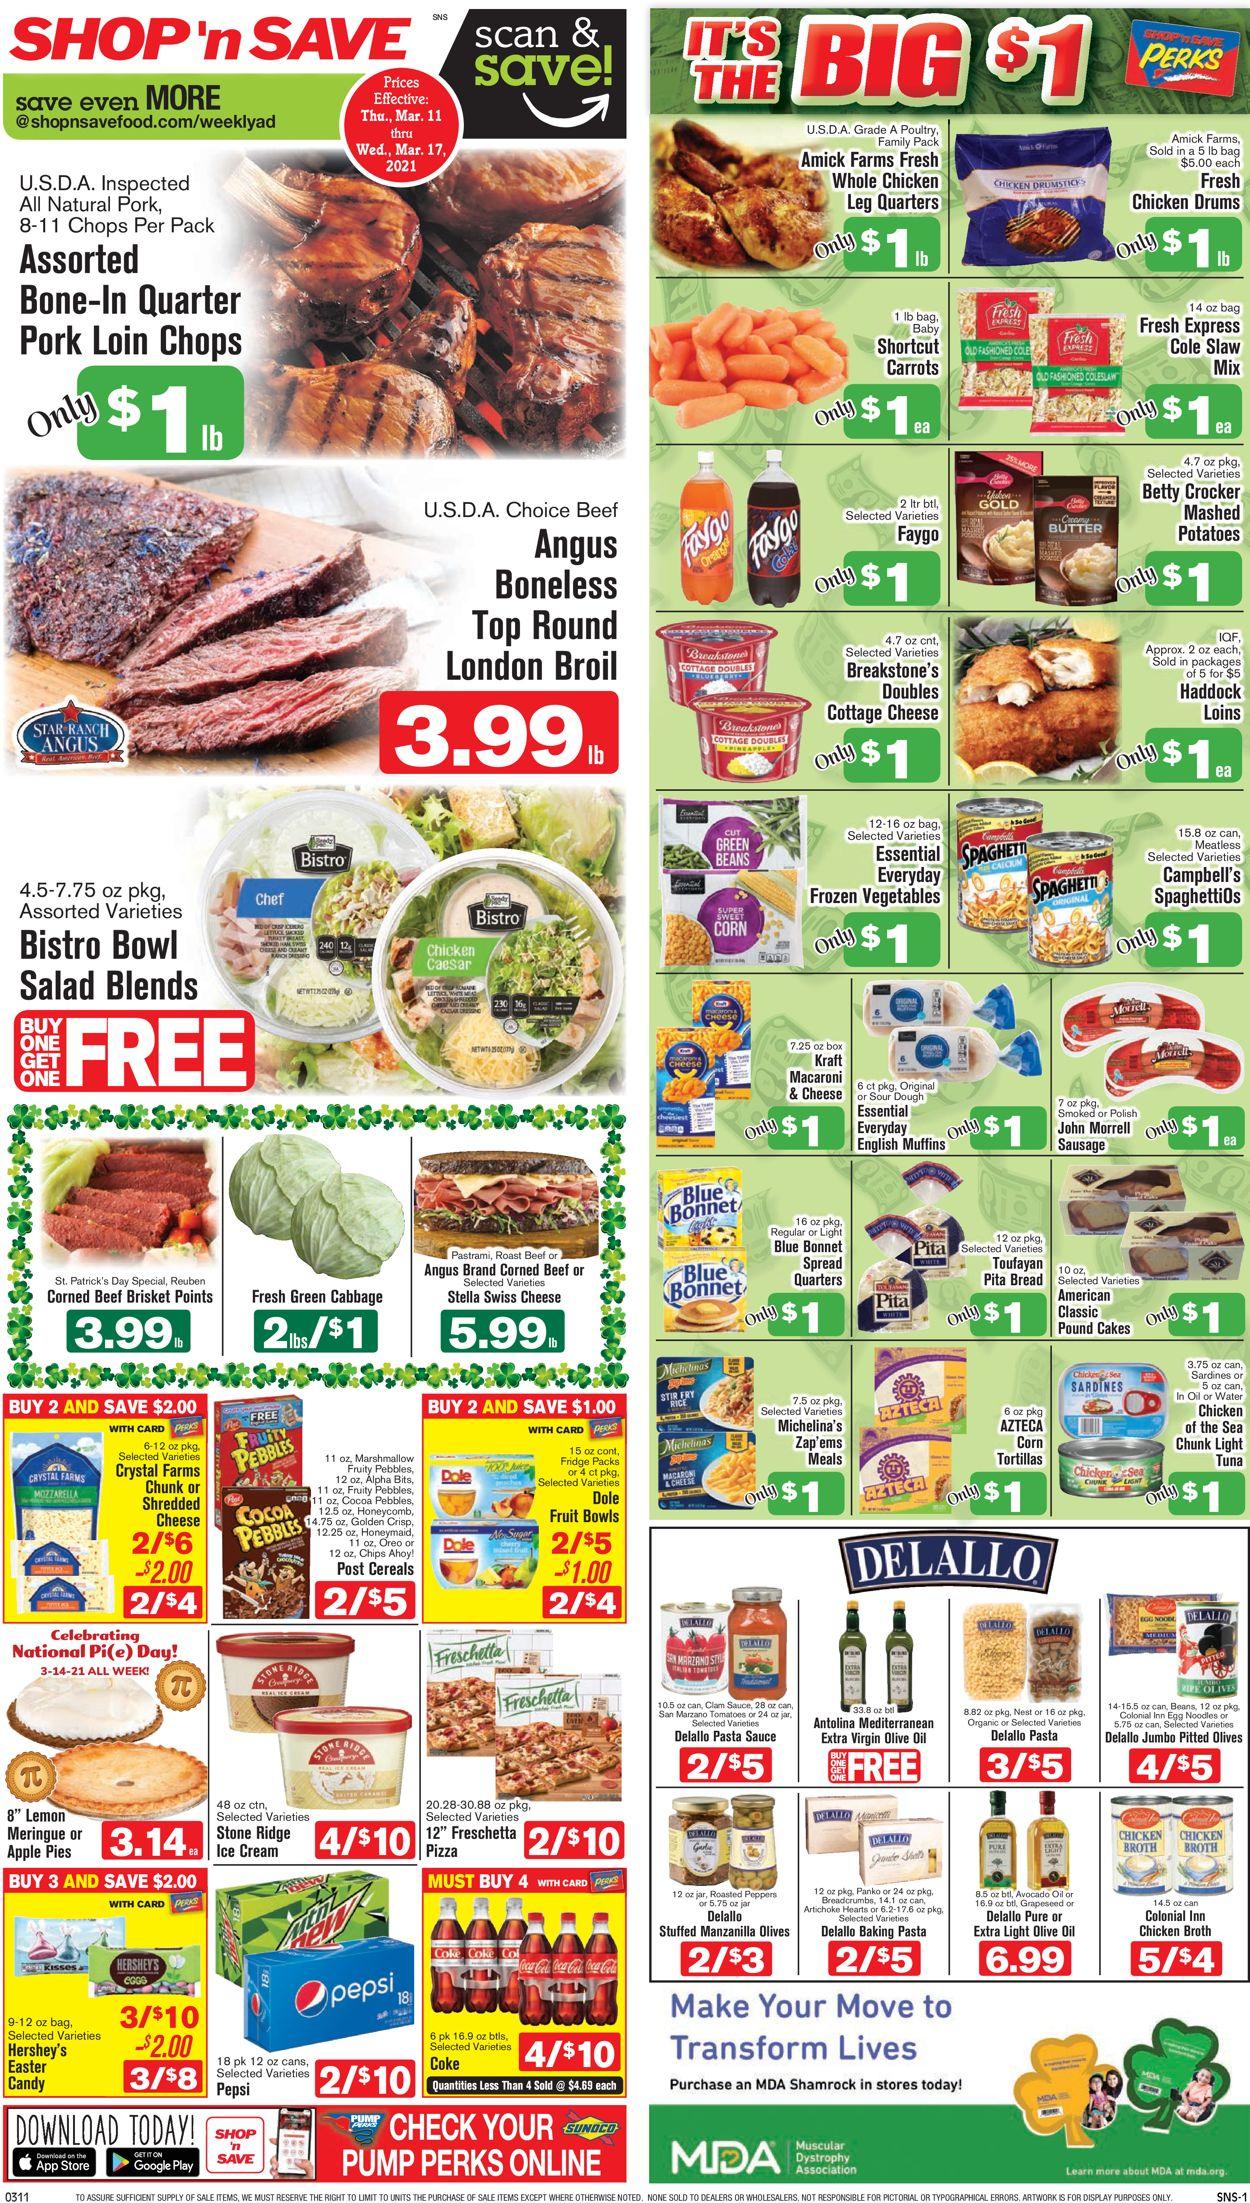 Shop 'n Save Weekly Ad Circular - valid 03/11-03/17/2021